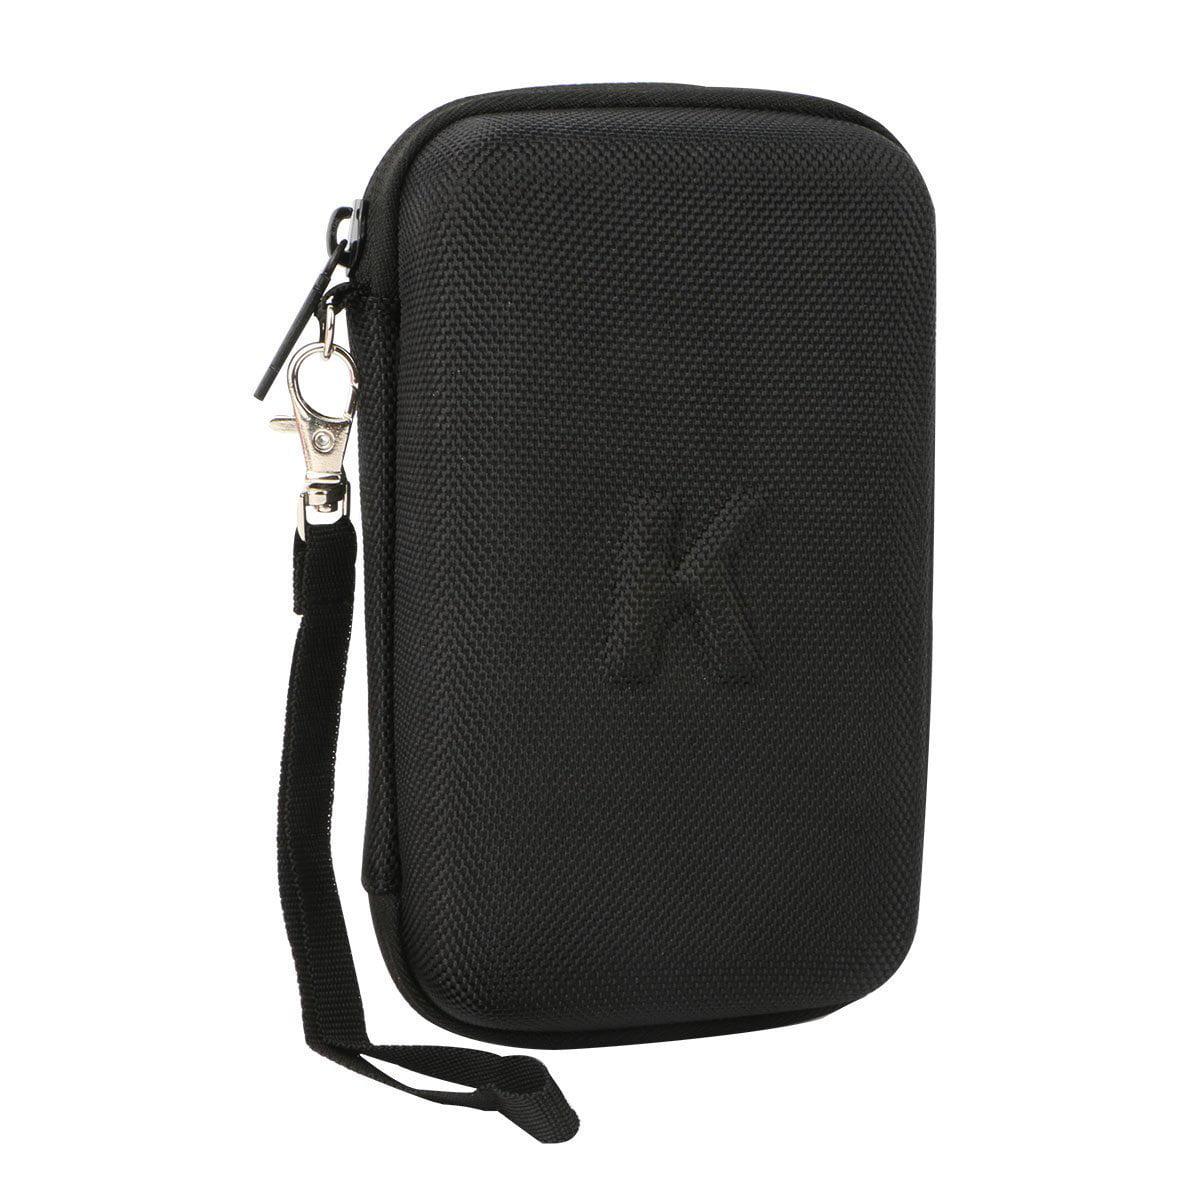 Hard Case Travel Storage Bag For Anker Astro E3 Ultra Compact 10000mah Black 10000 Portable Charger External Battery Power Bank Mesh Pocket Usb Wall Car